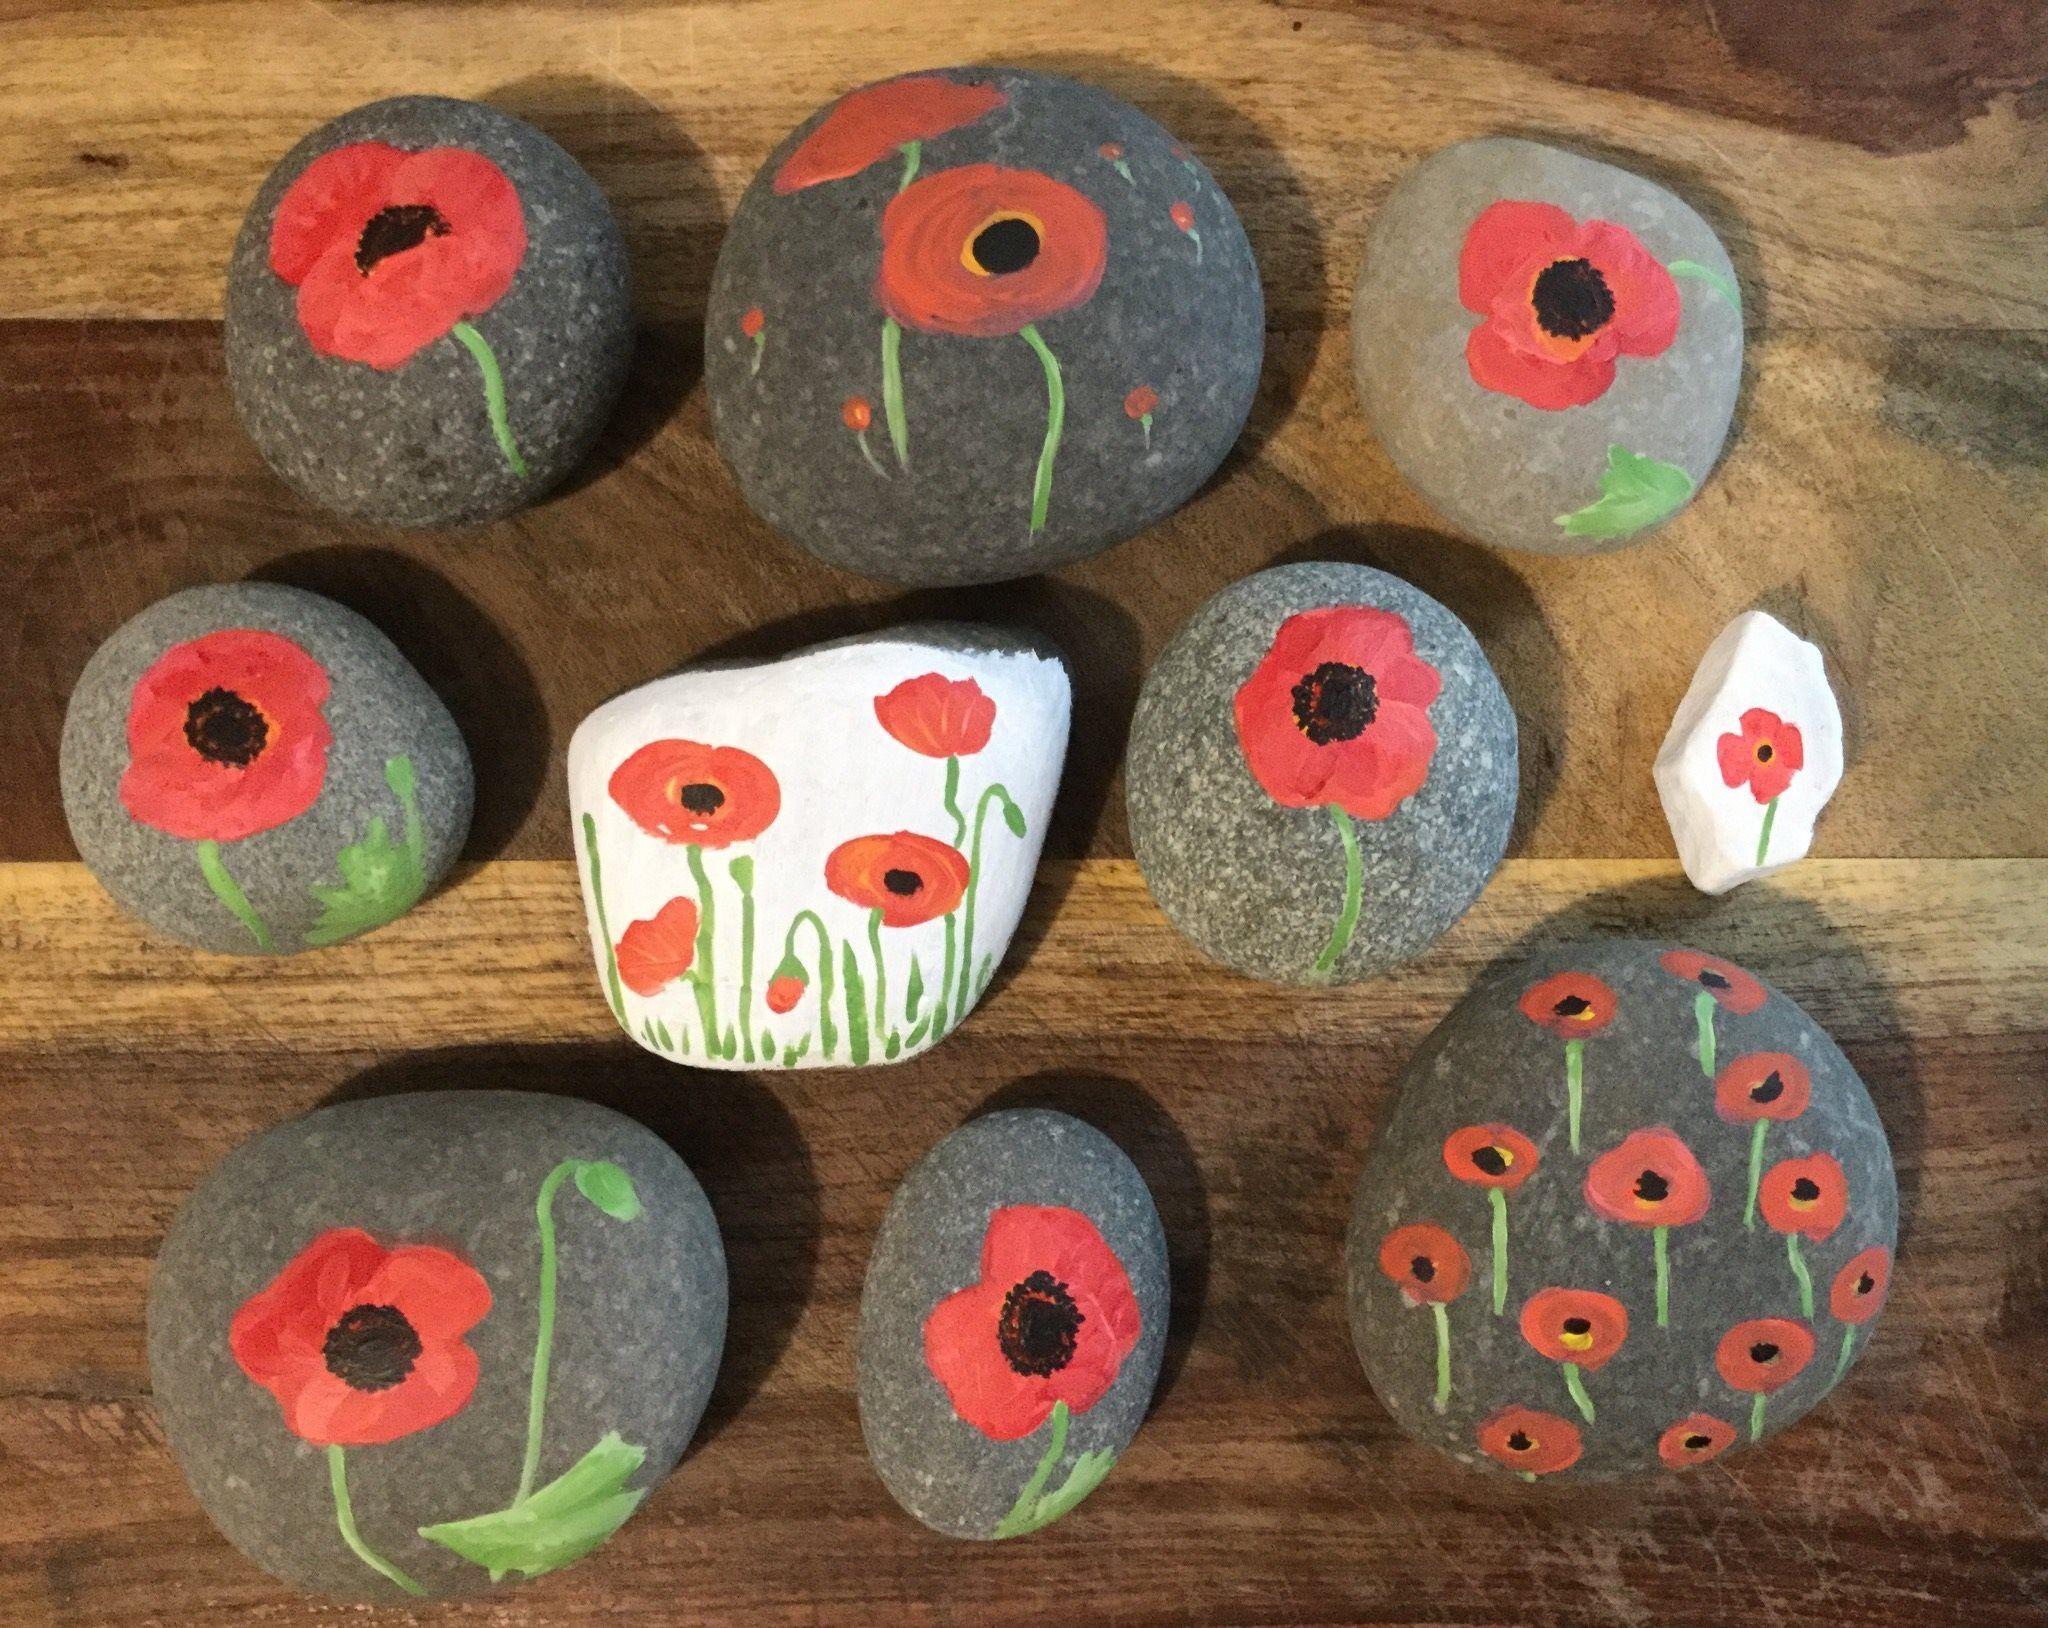 Painted Rocks Memorial Day Poppy Northeast Ohio Rocks! #northeastohiorocks #poppycraftsforkids